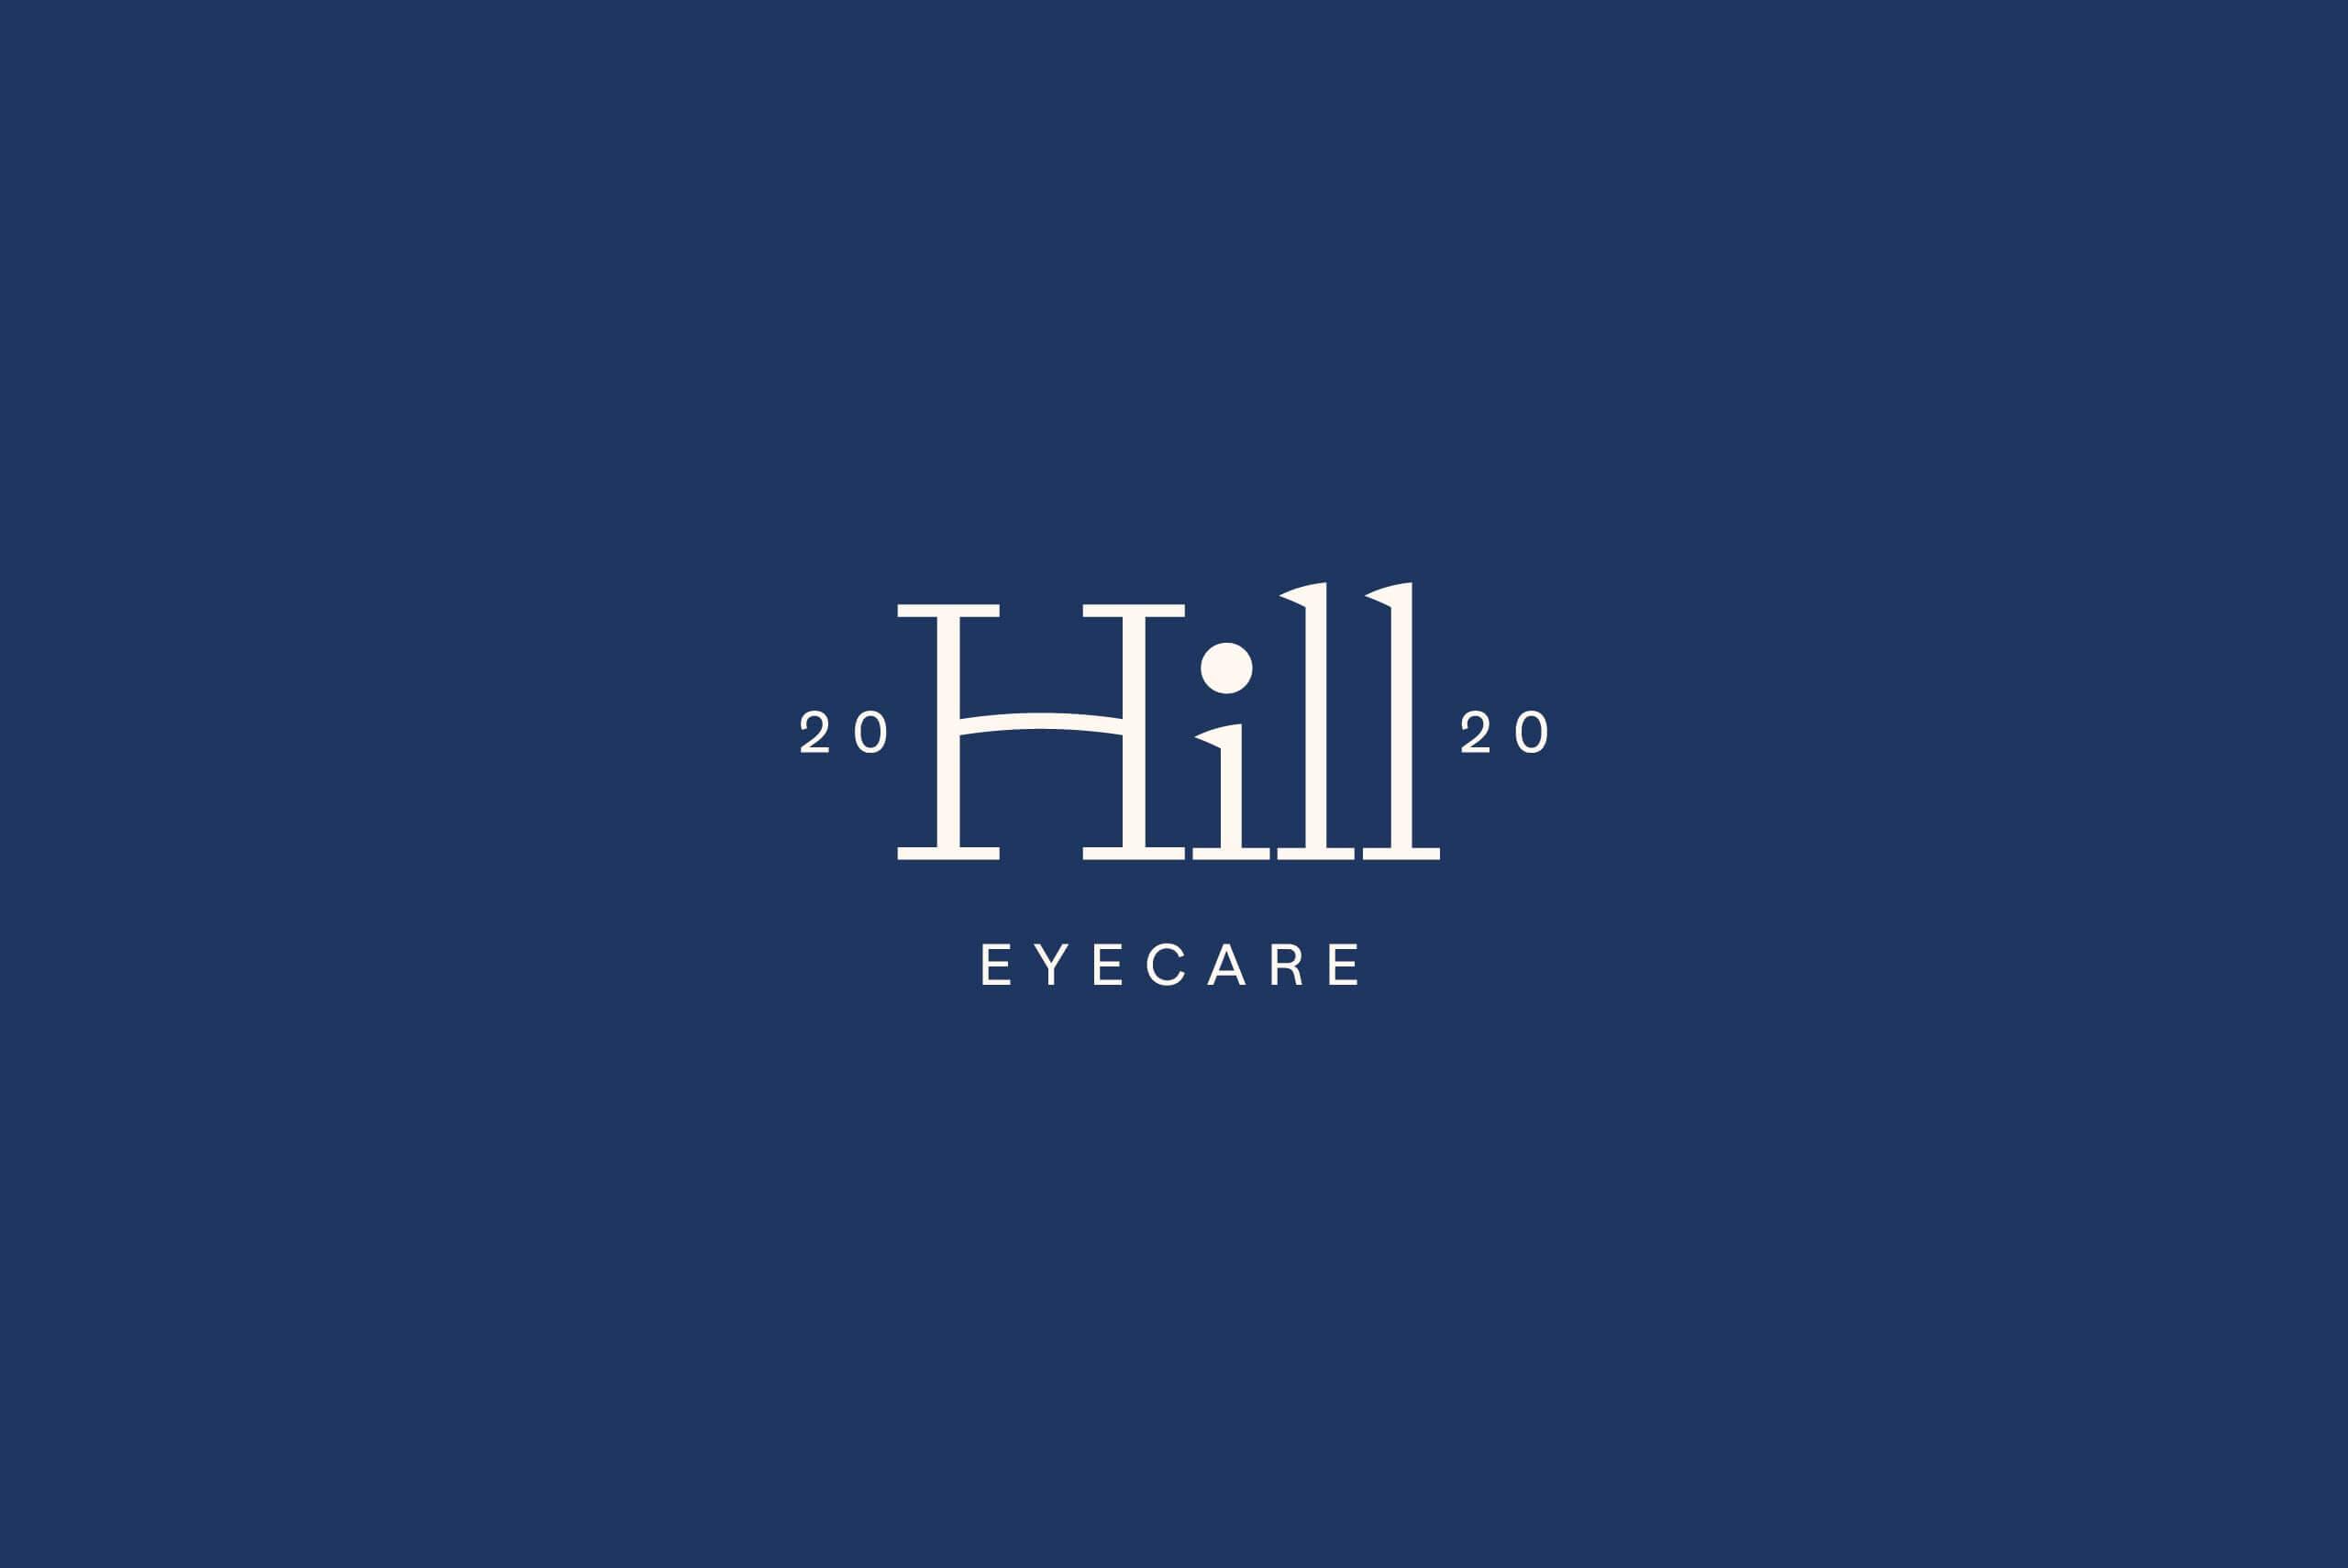 FRH-Hill-Eyecare1-copy-2